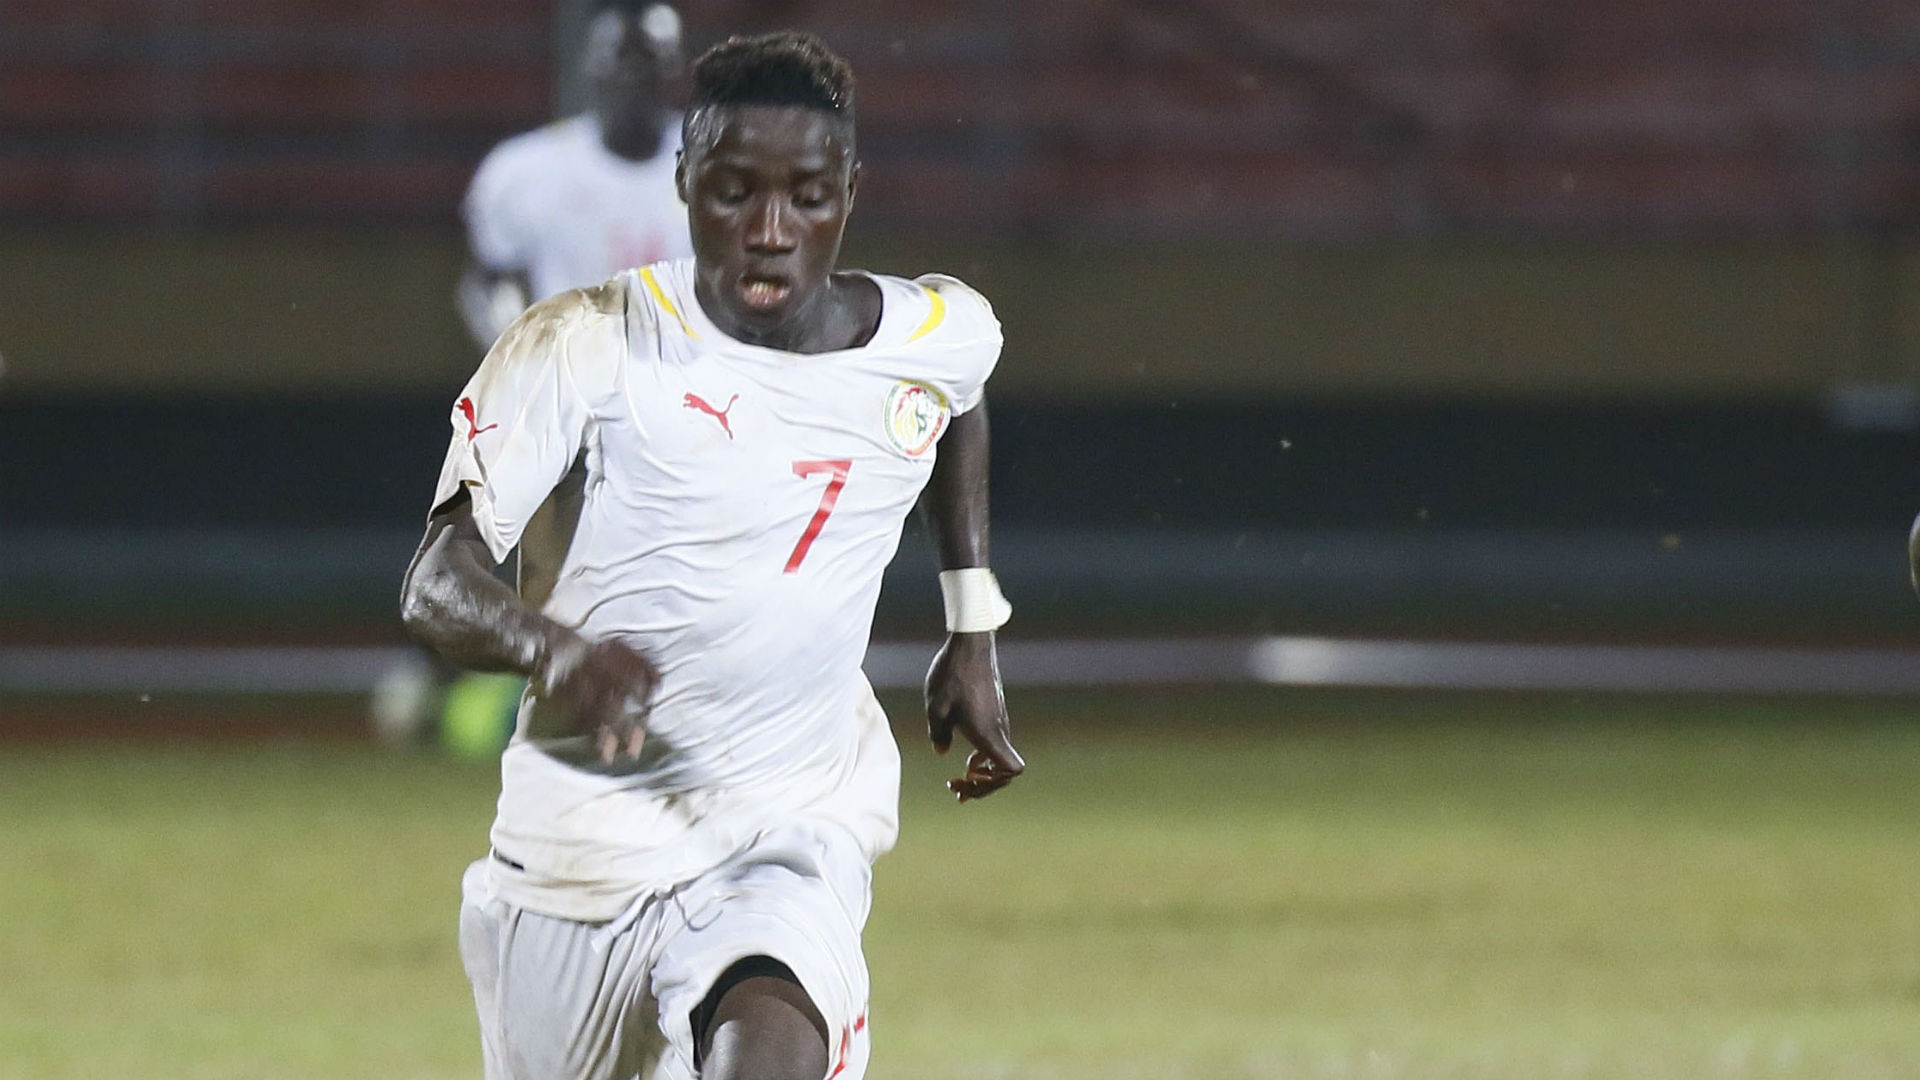 Senegal's Amadou Sagna sets fastest U20 World Cup goal record